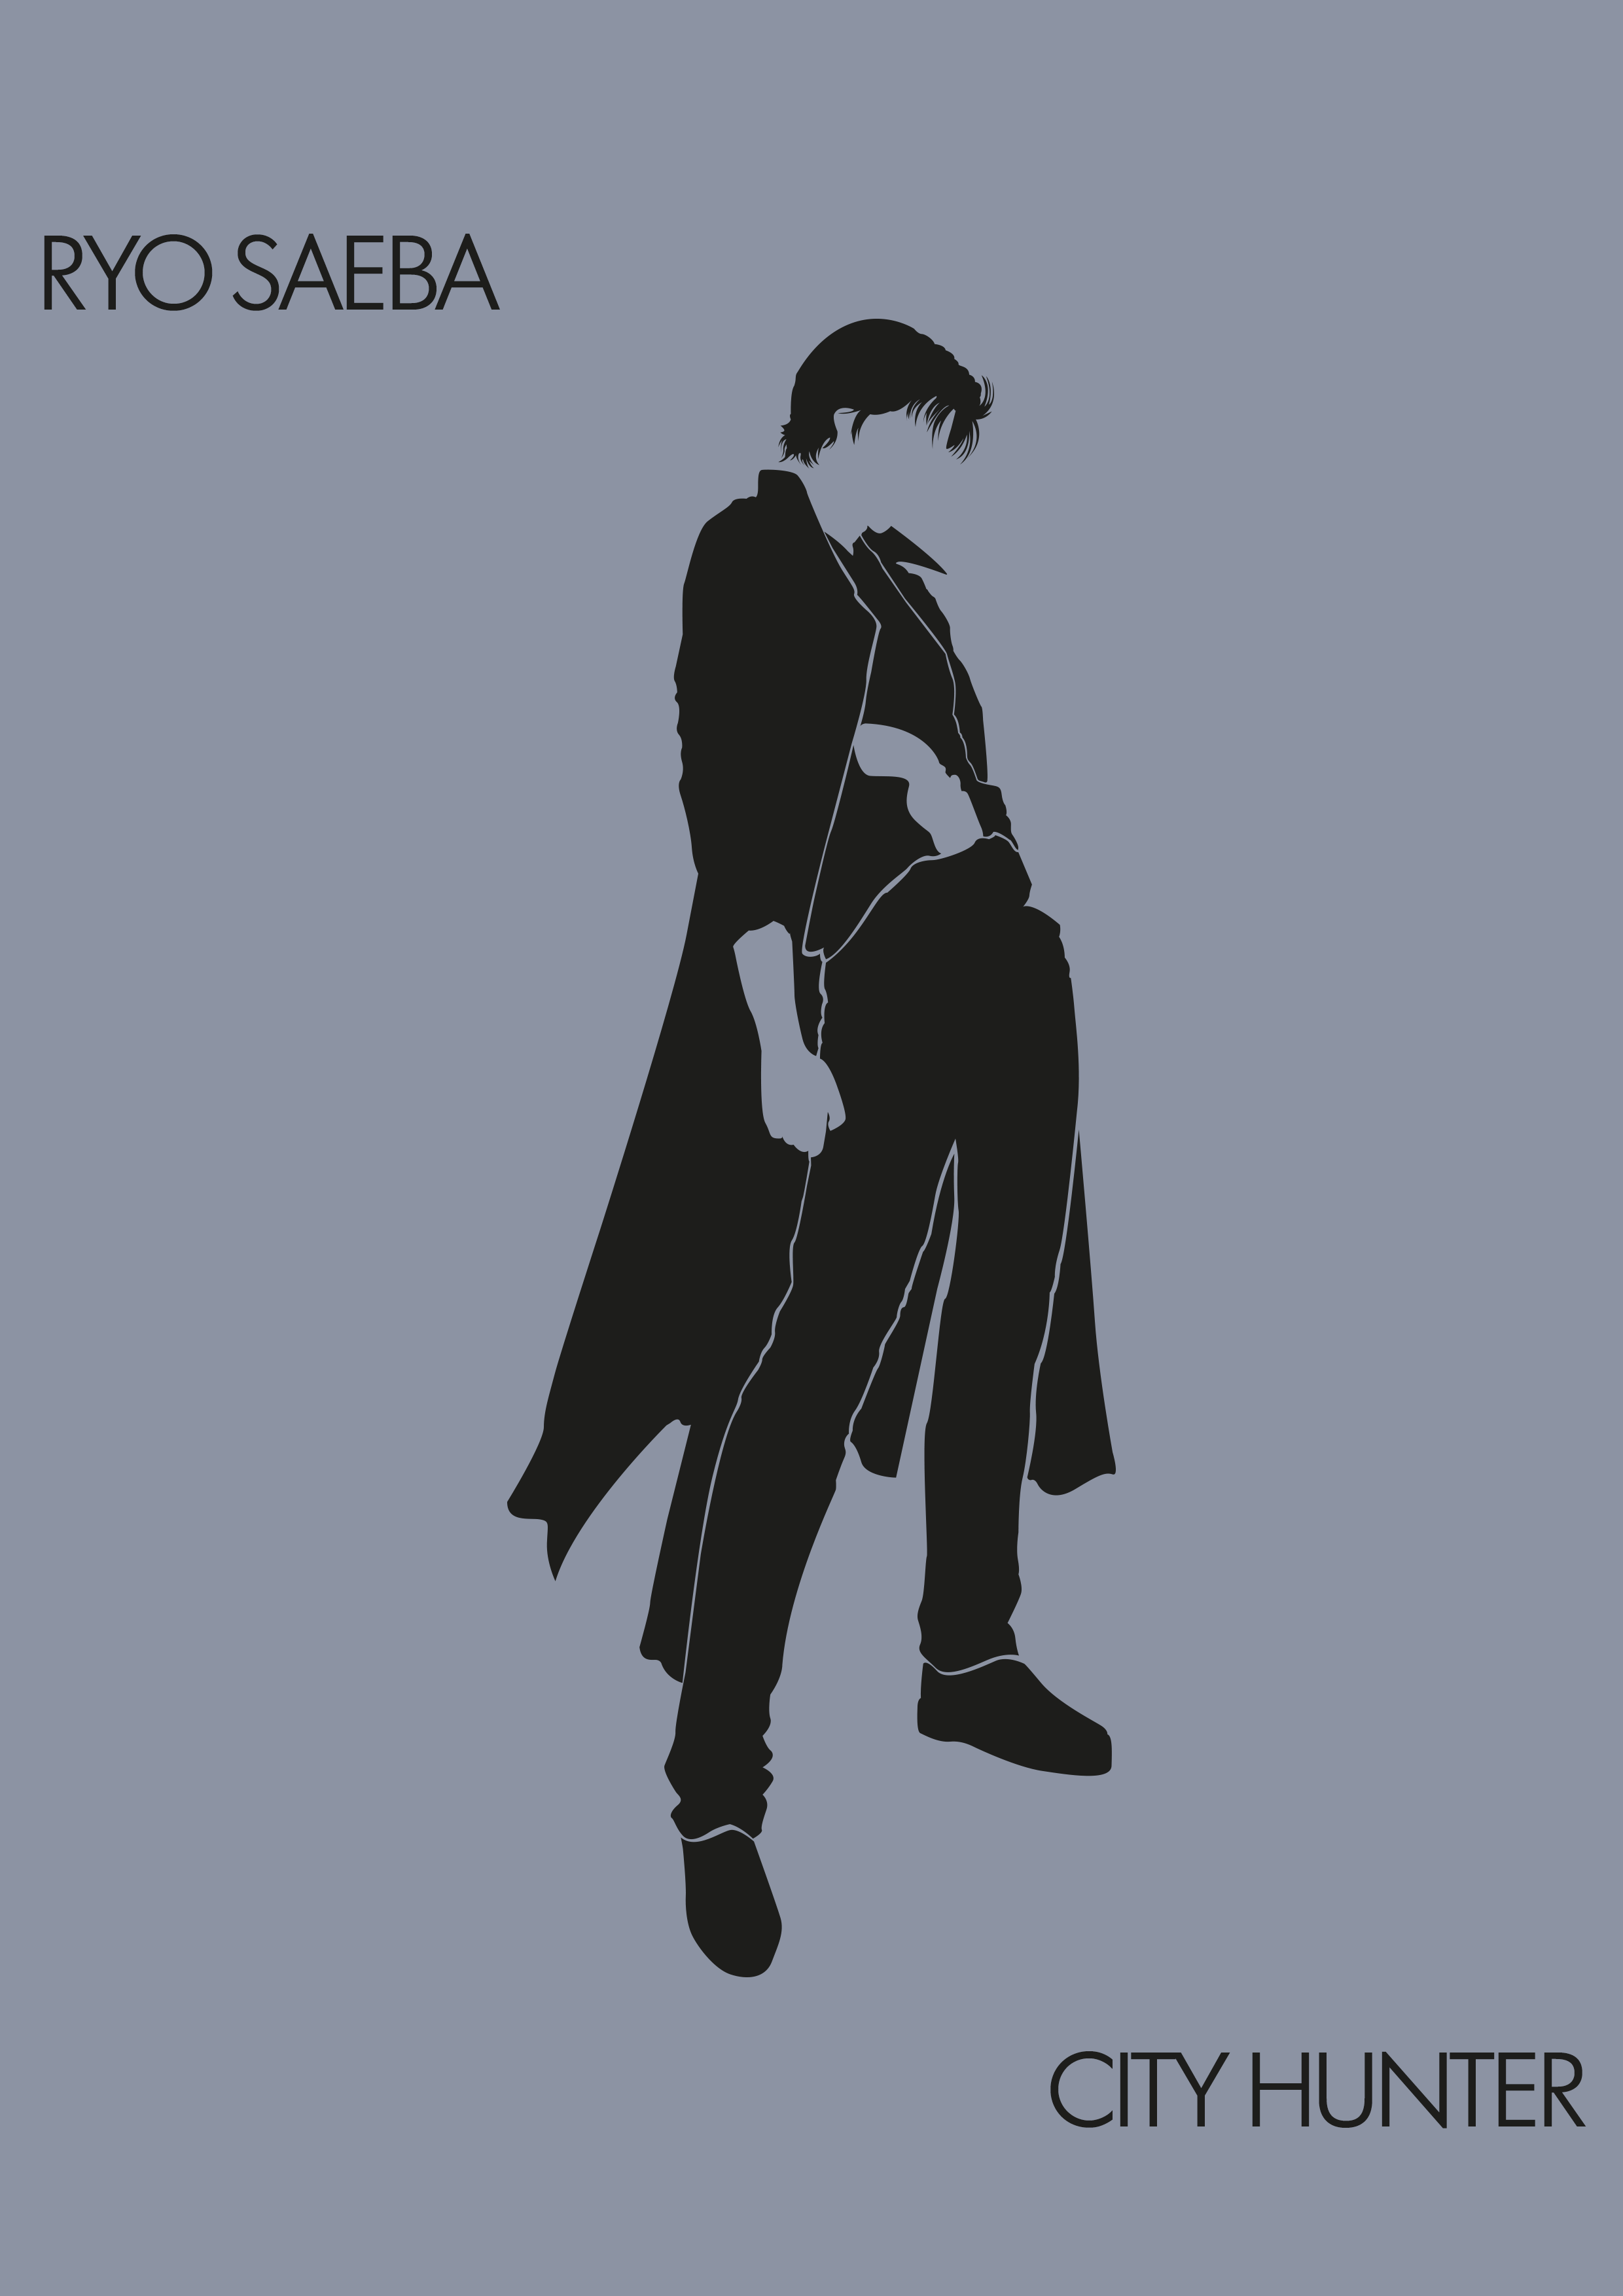 Ryo Saeba - City Hunter by lestath87 on DeviantArt